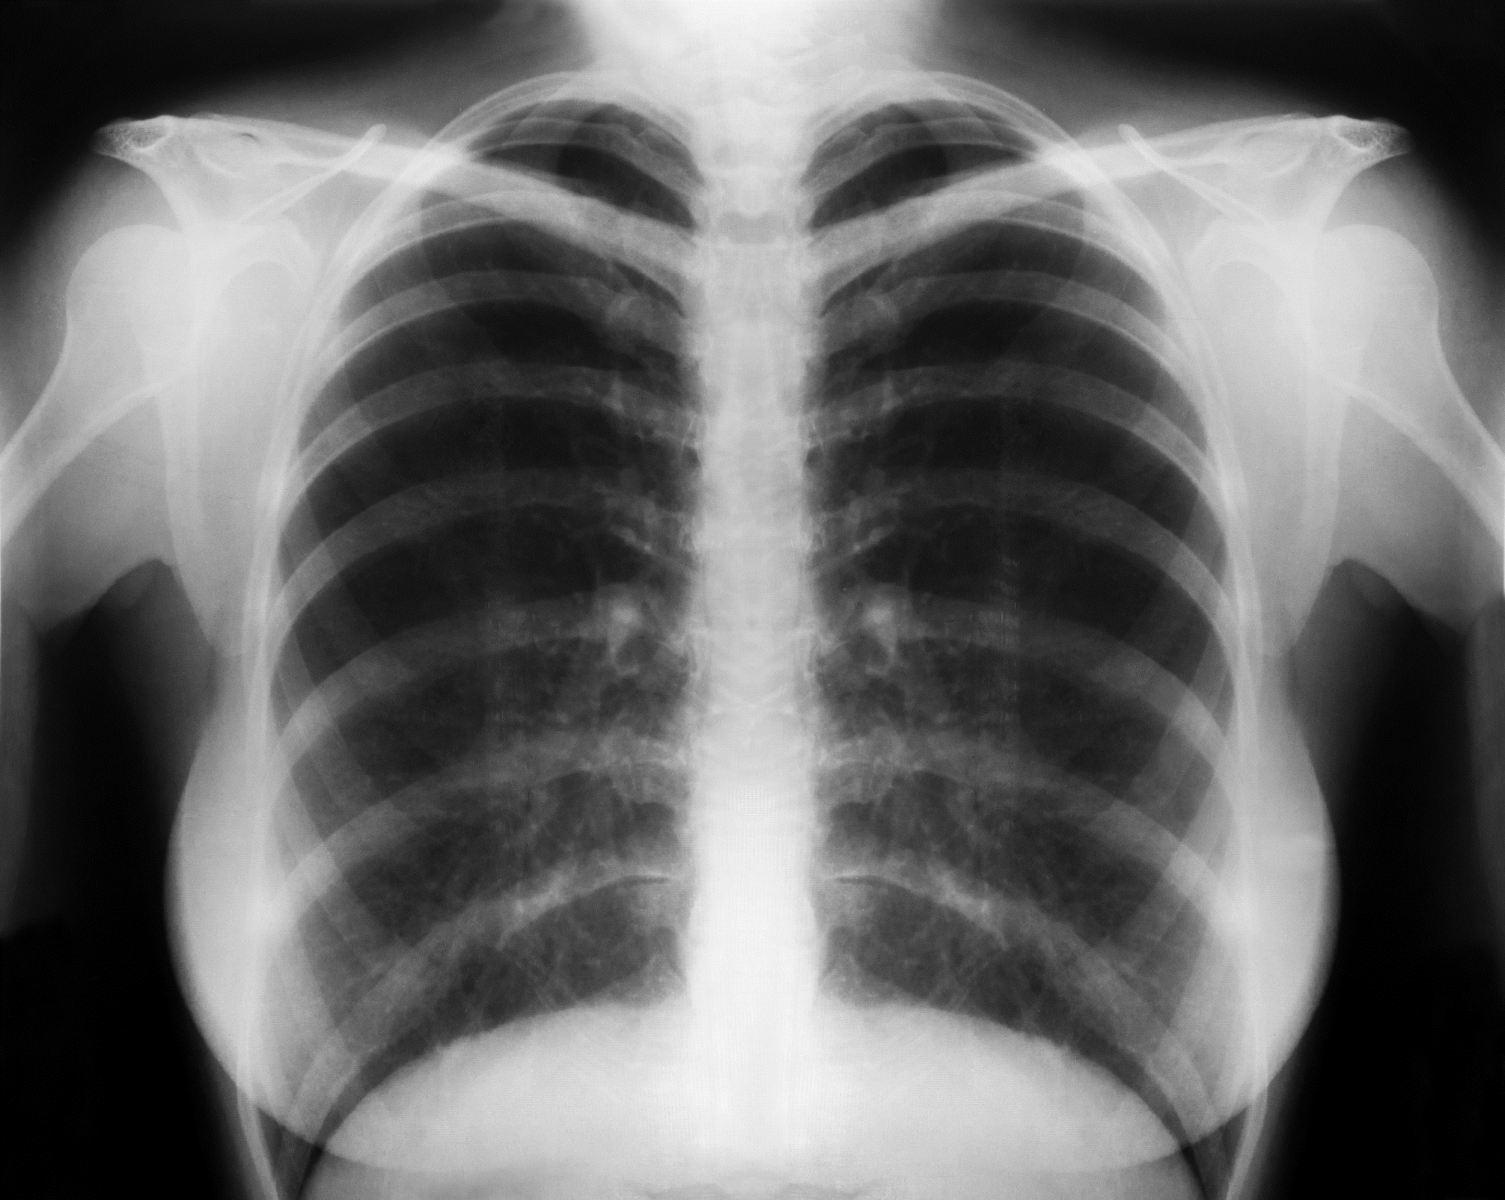 Flavorings-Related Lung Disease